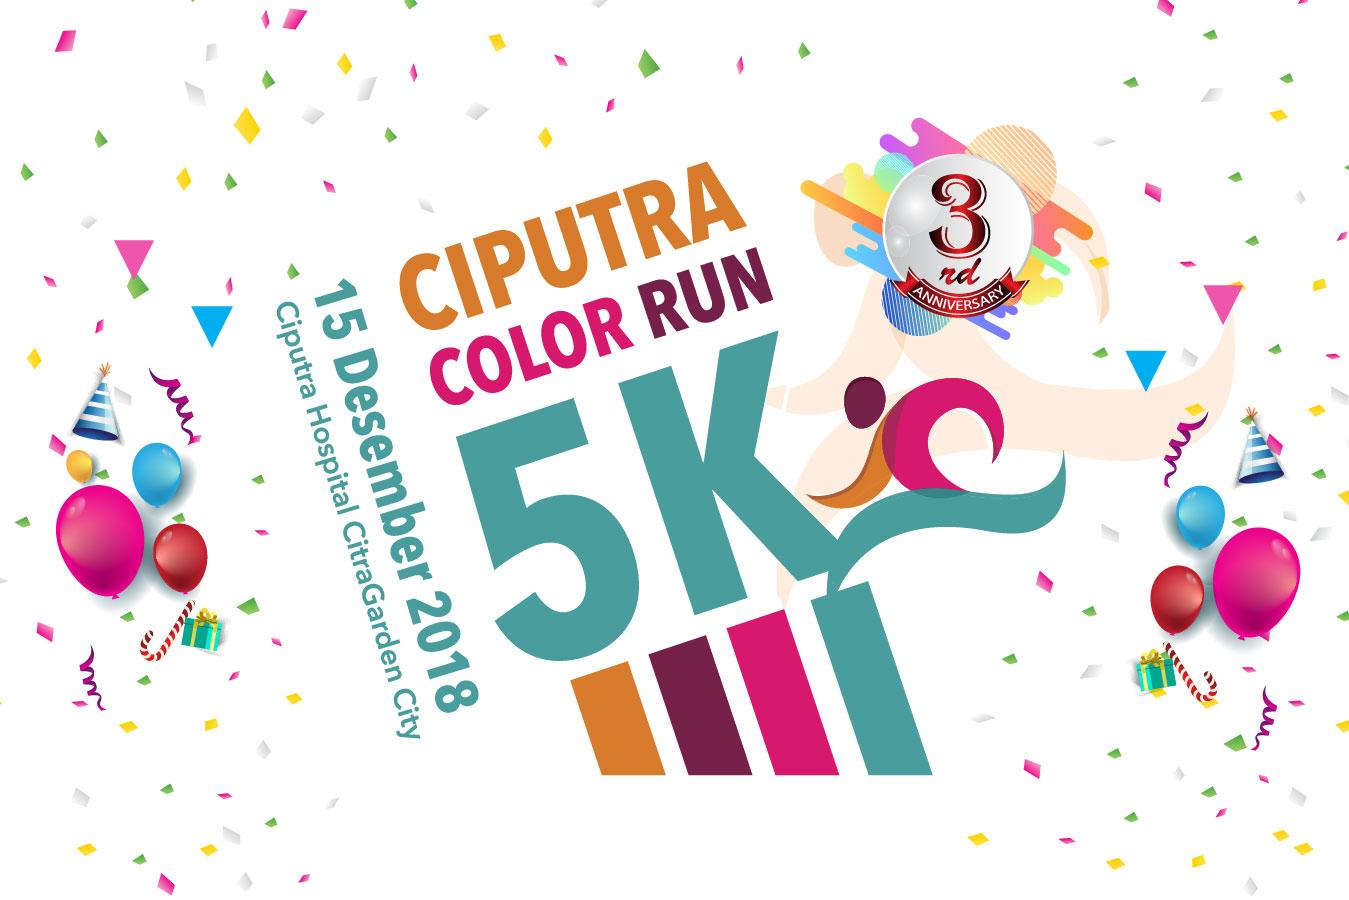 hut cgc 3 color run